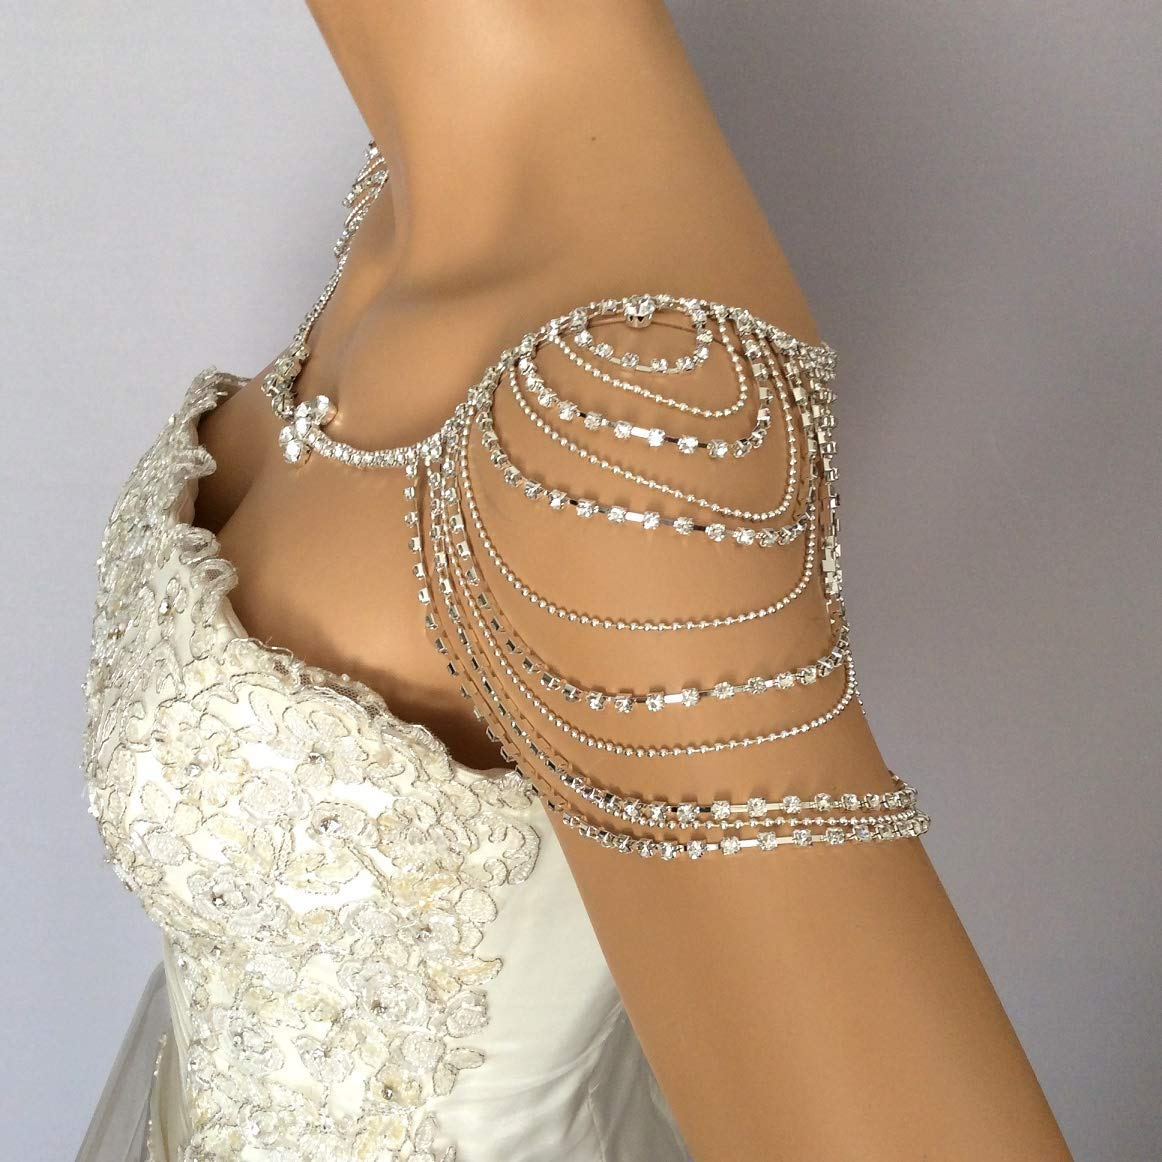 Rhinestone Shoulder Jewelry For Bridal, Crystal Wedding Dress Shoulder Necklace, Body Accessory For Wedding Dress Wedding Shoulder Necklace